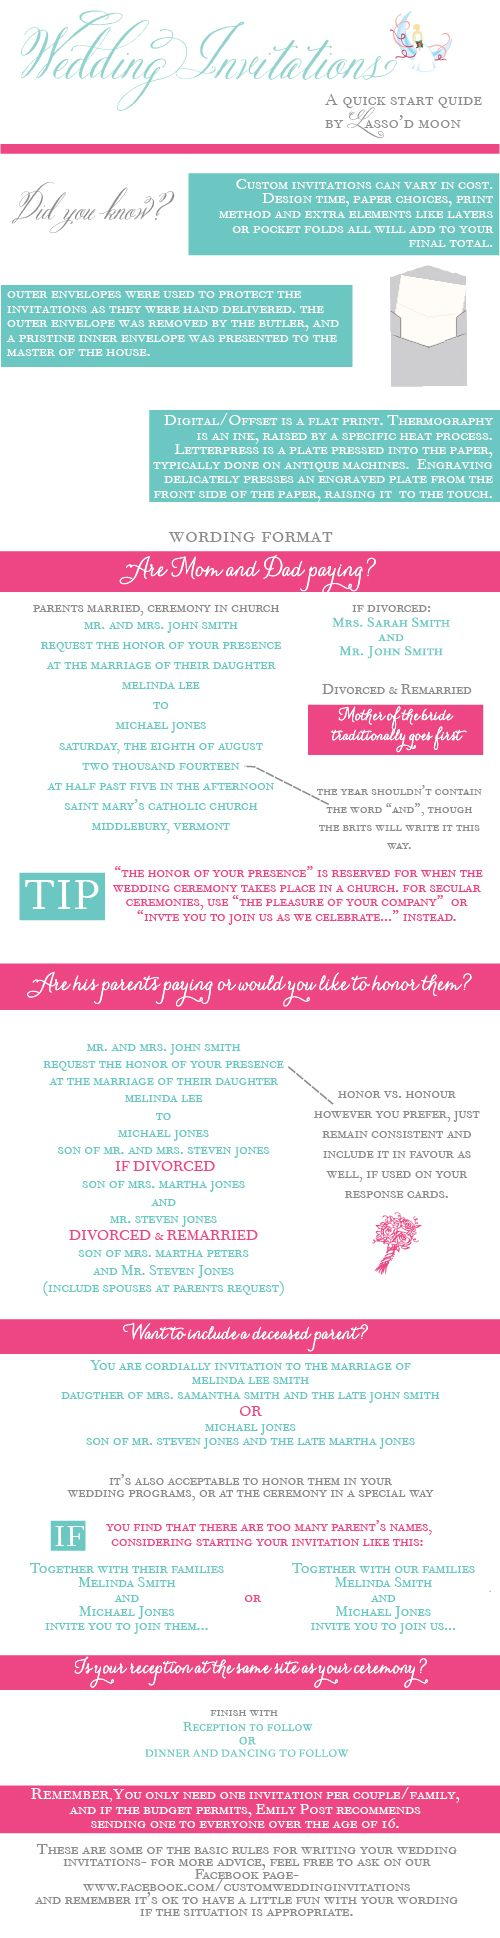 Wedding Invitation Quick Start Guide Infographic :: WeddingLovely Blog